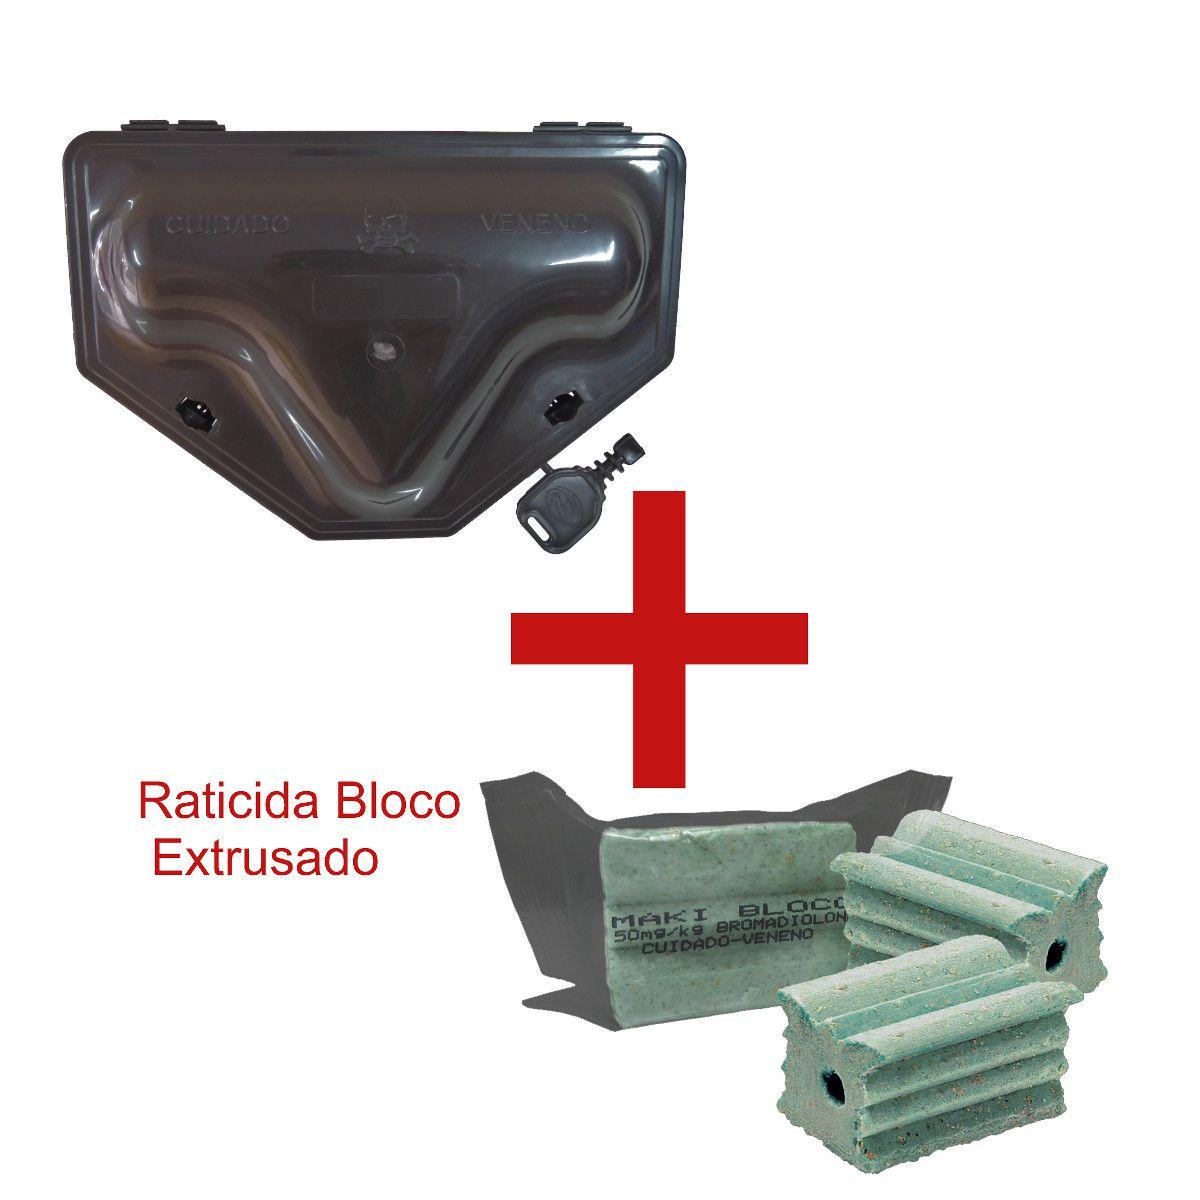 KIT 900 Porta Iscas Reforçado Ratoeira 2 TRAVAS Chave Ratos